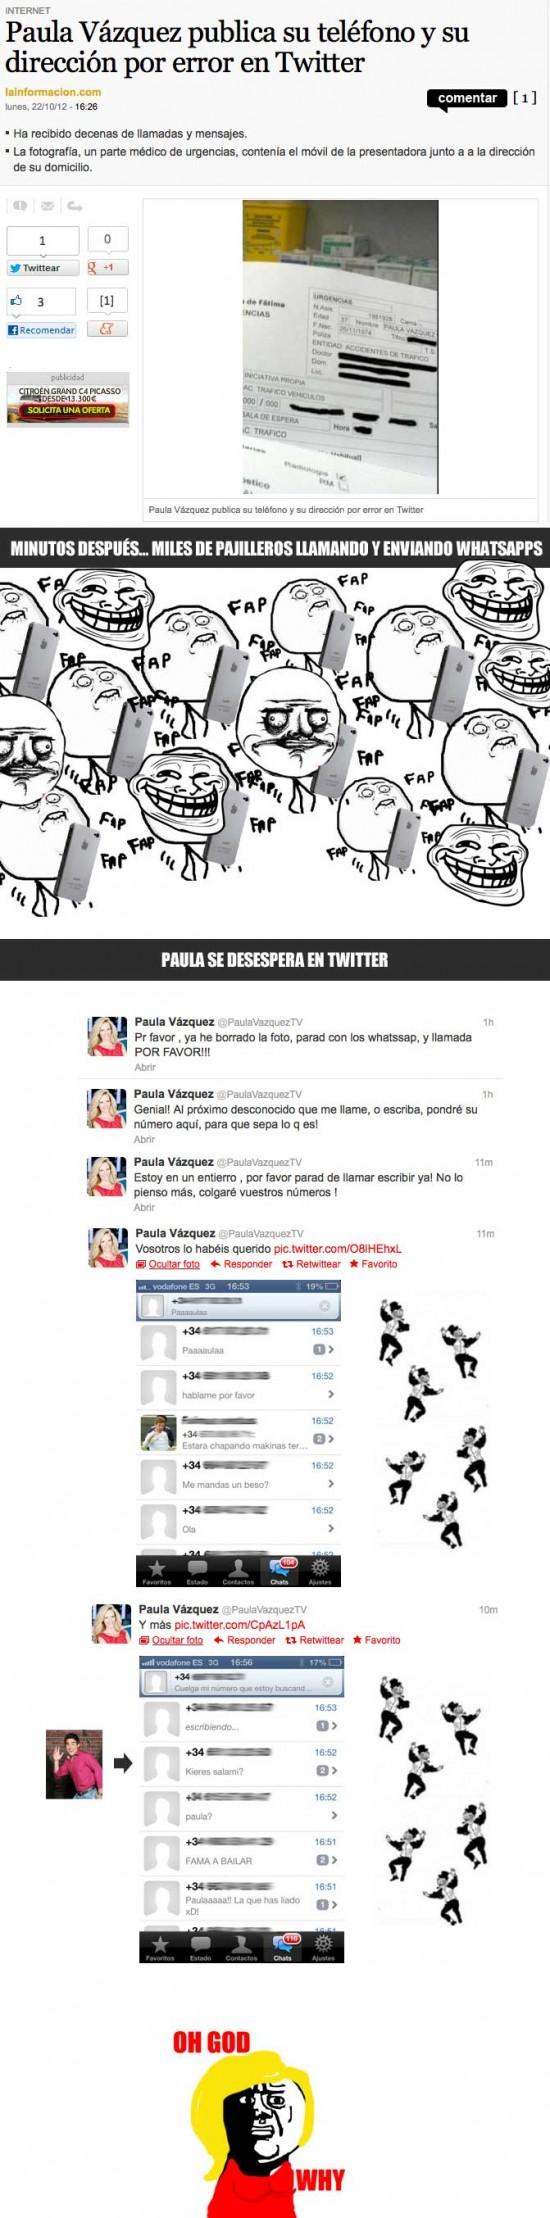 descuido,llamadas,paula vazquez,trolls,twitter,whatsapp